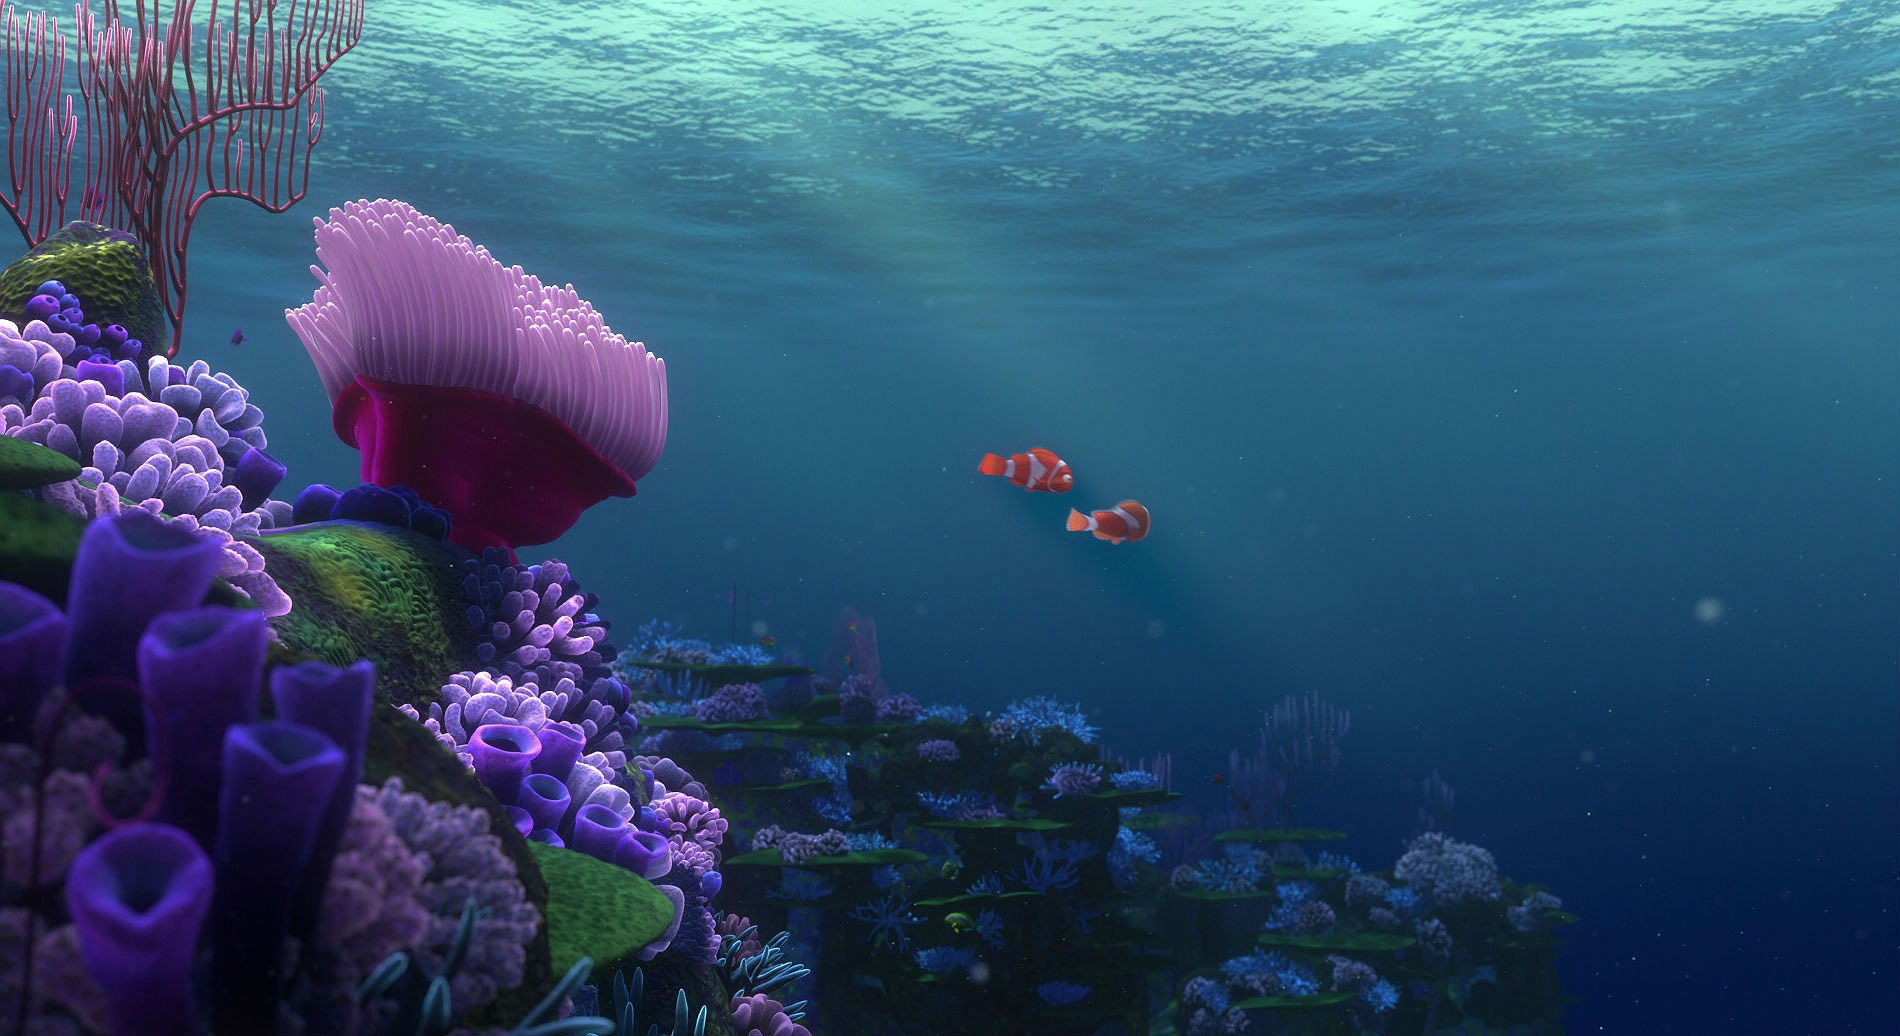 FINDING NEMO Animation Underwater Sea Ocean Tropical Fish Adventure Family Comedy Drama Disney 1finding Nemo Wallpaper